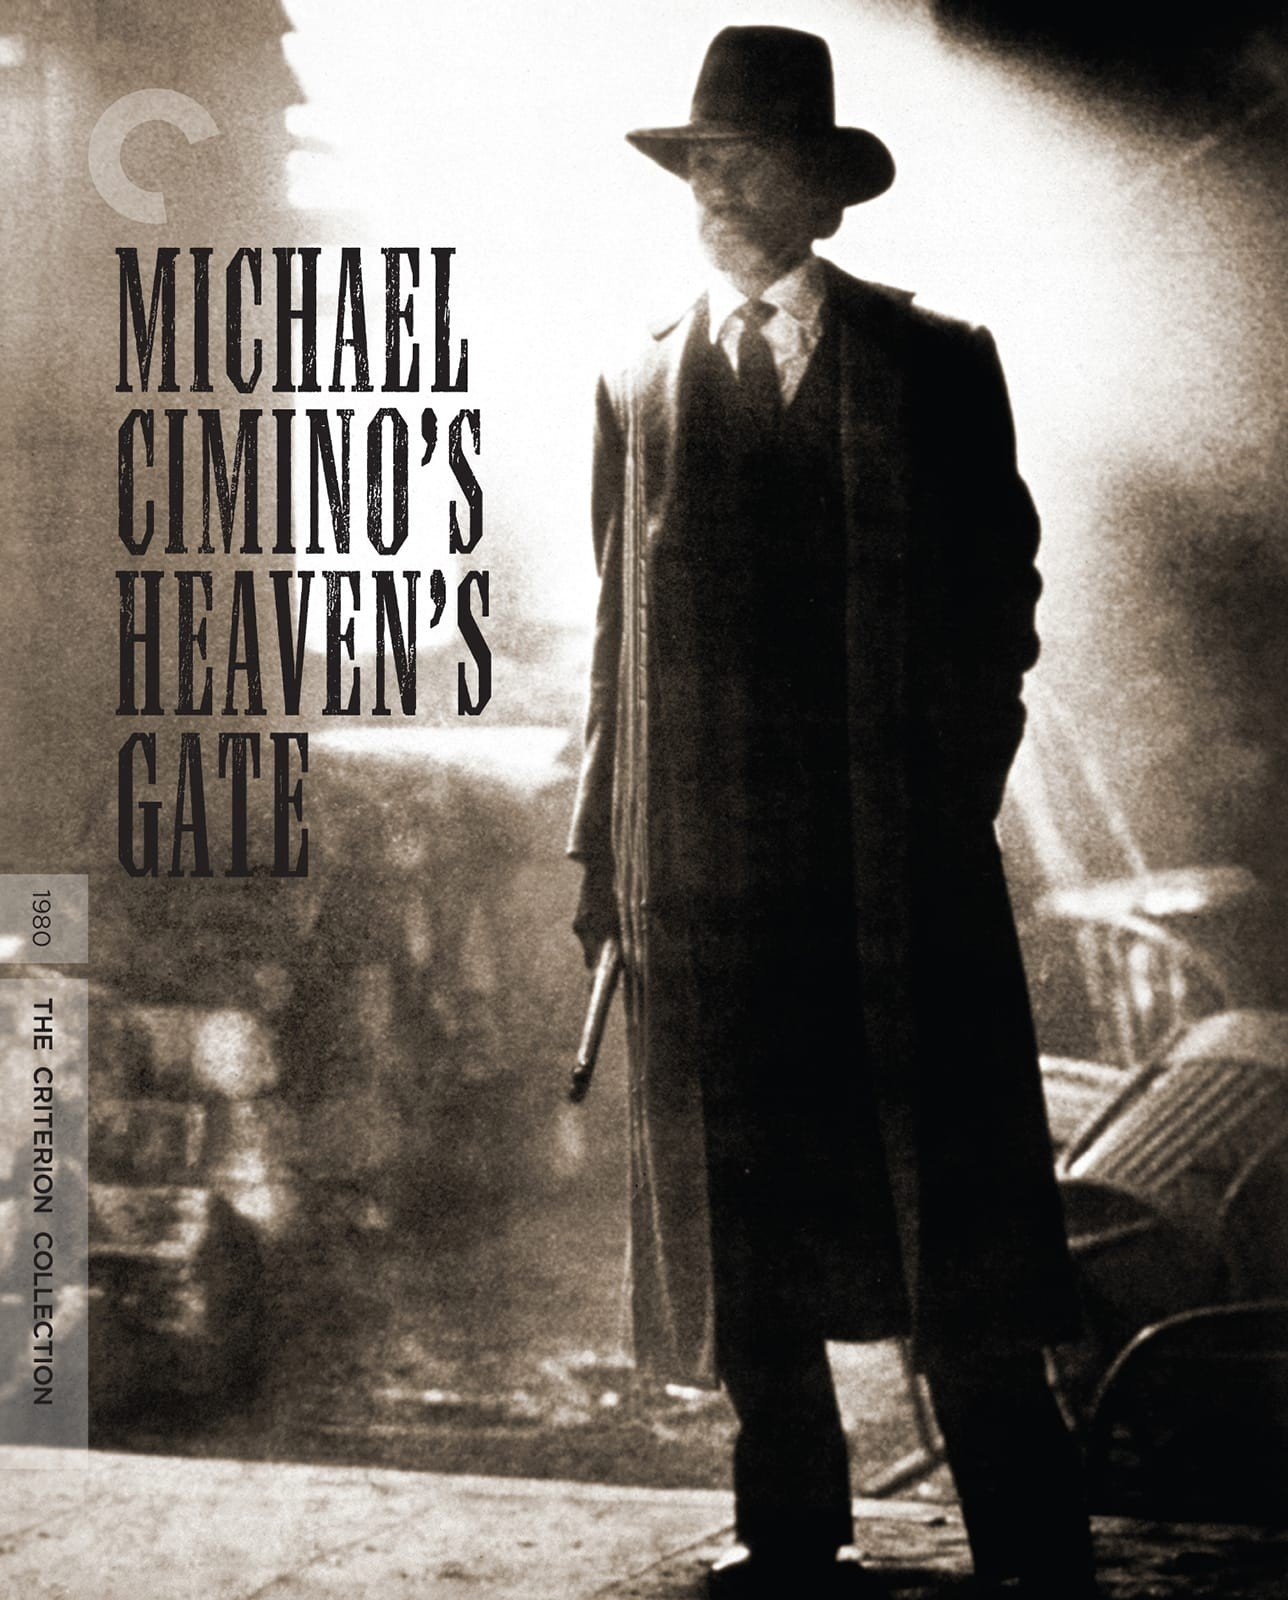 knockin on heavens door movie watch online english